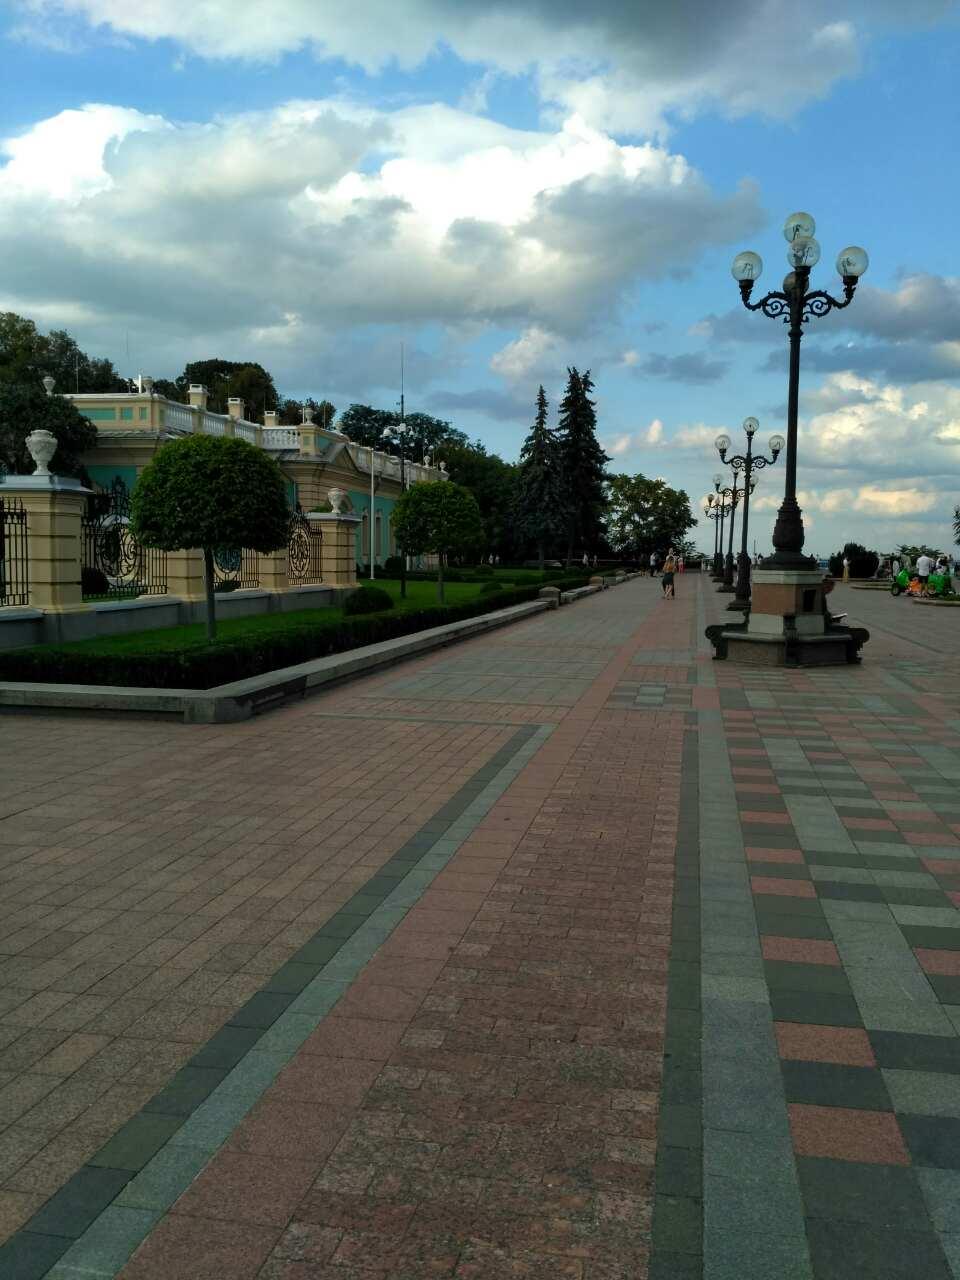 Мариинский дворец в Киеве: фото, история, архитектура